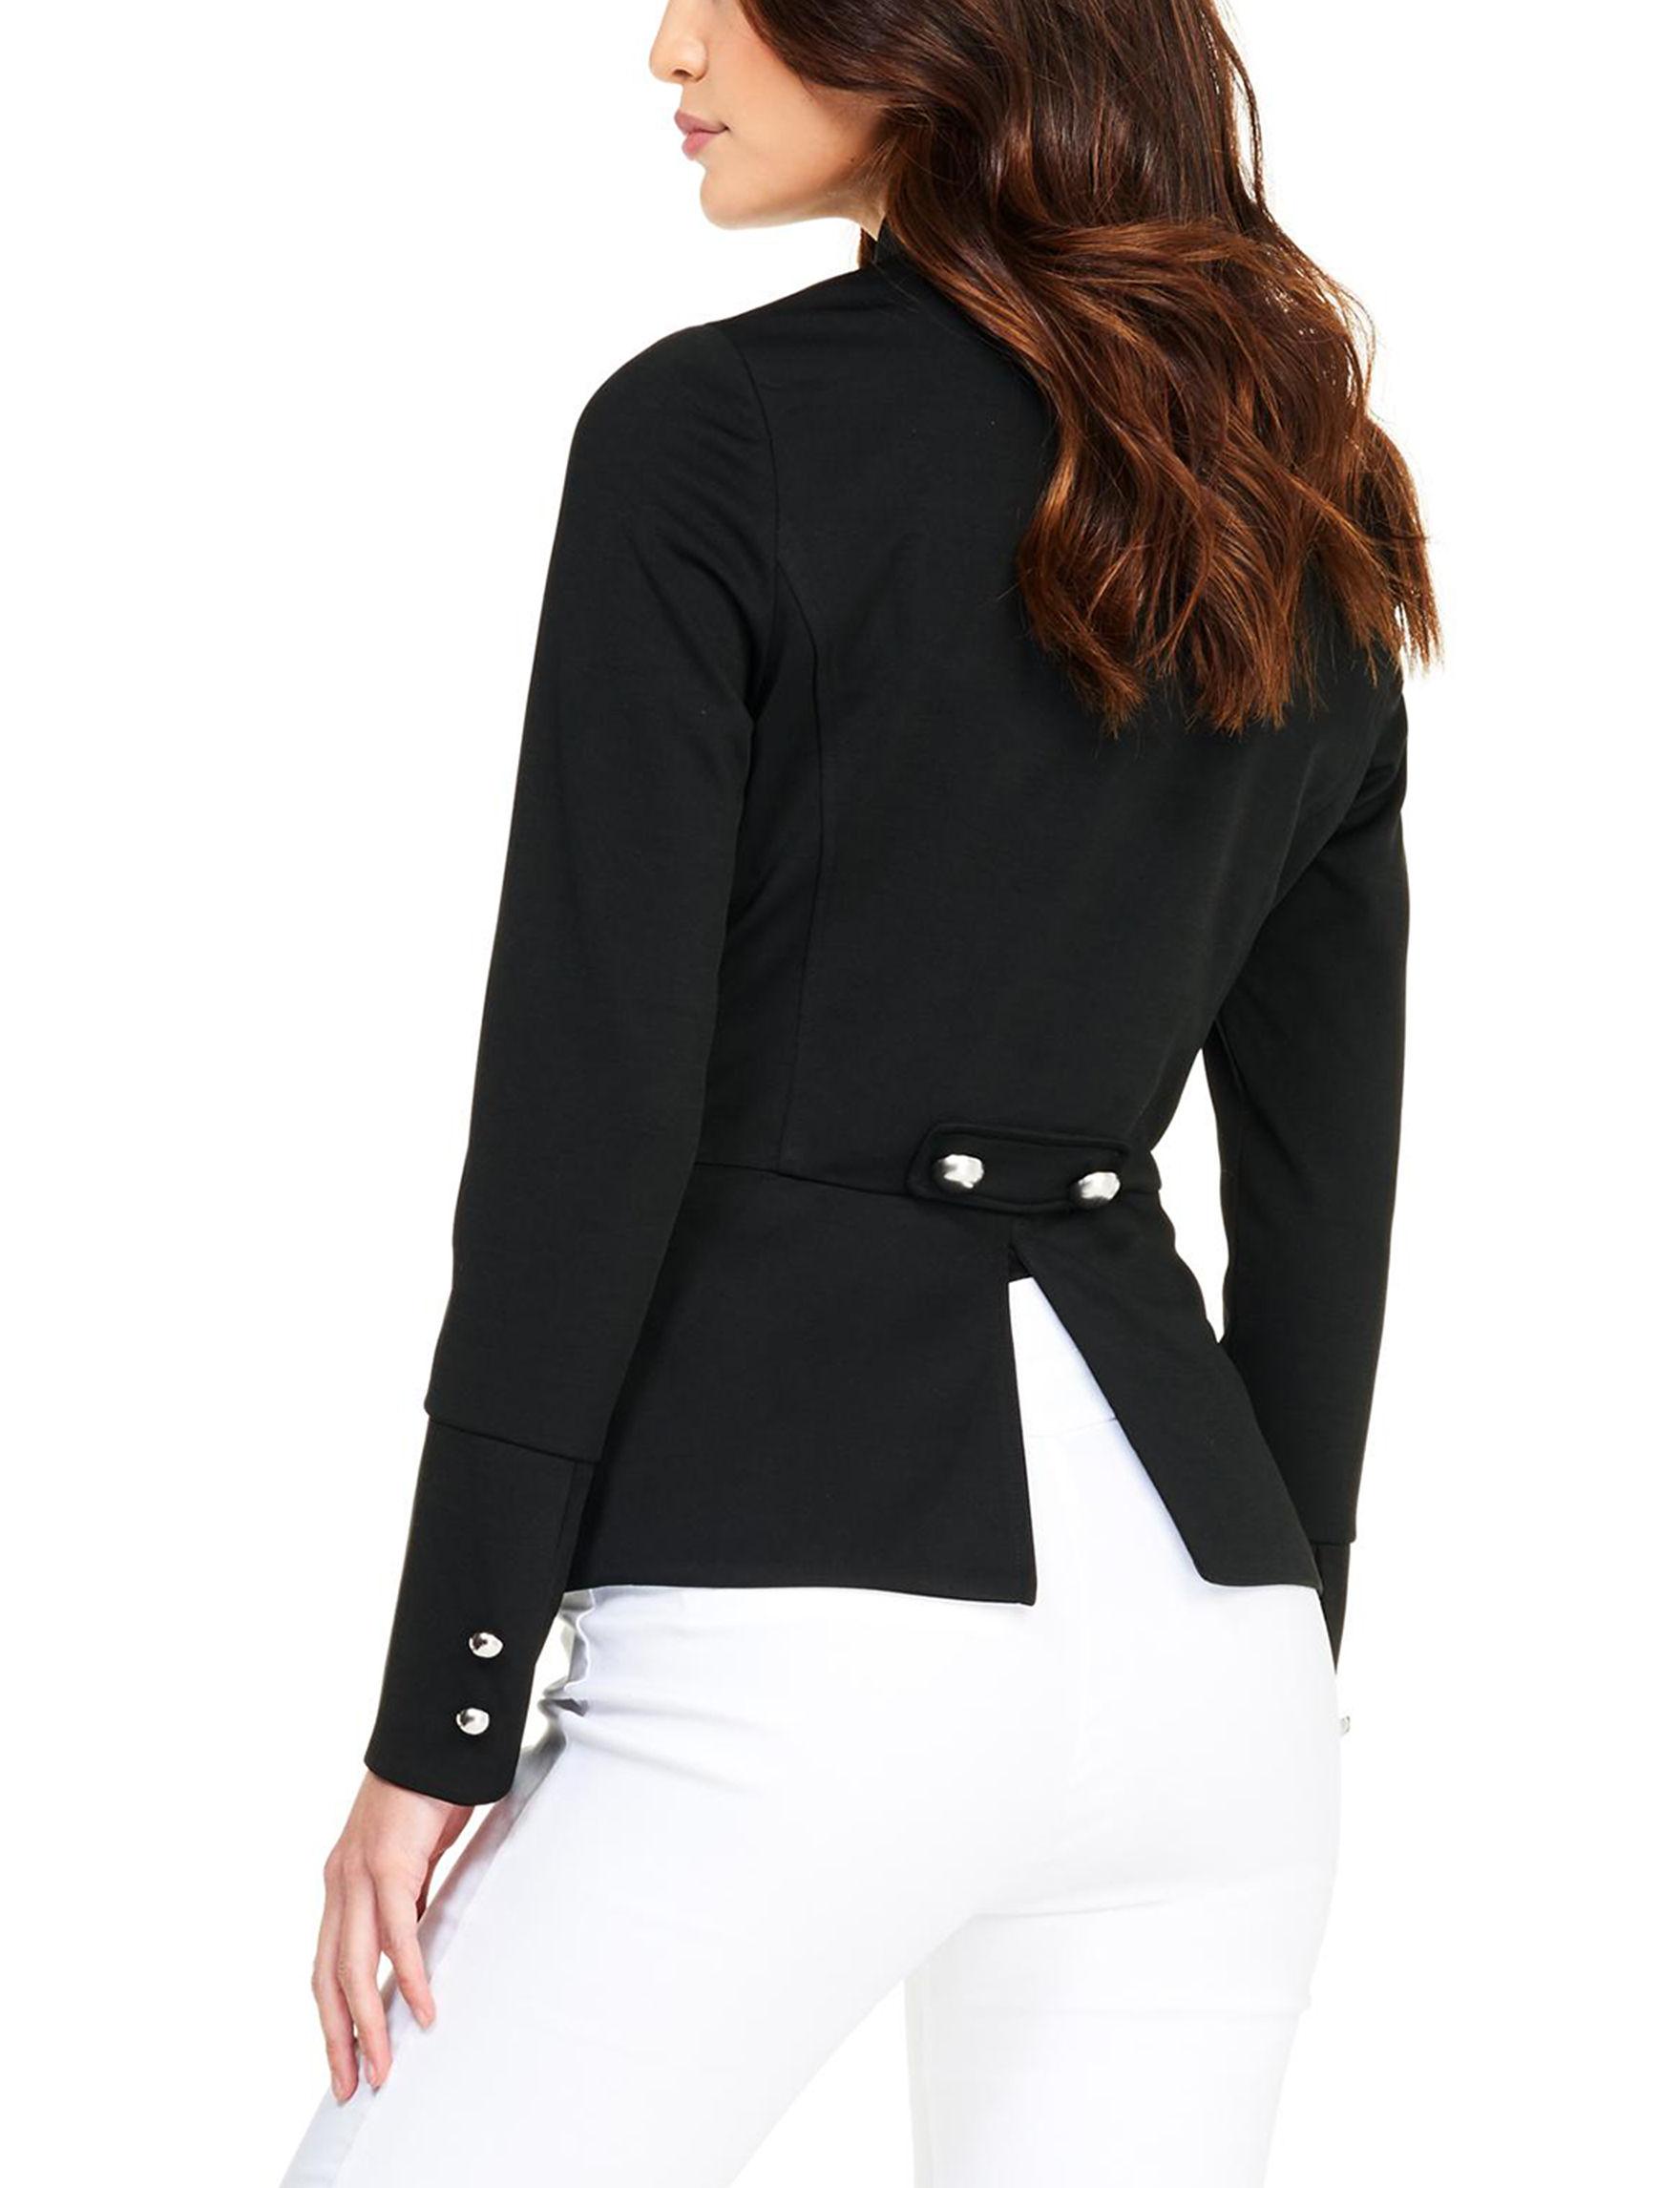 XOXO Black Lightweight Jackets & Blazers